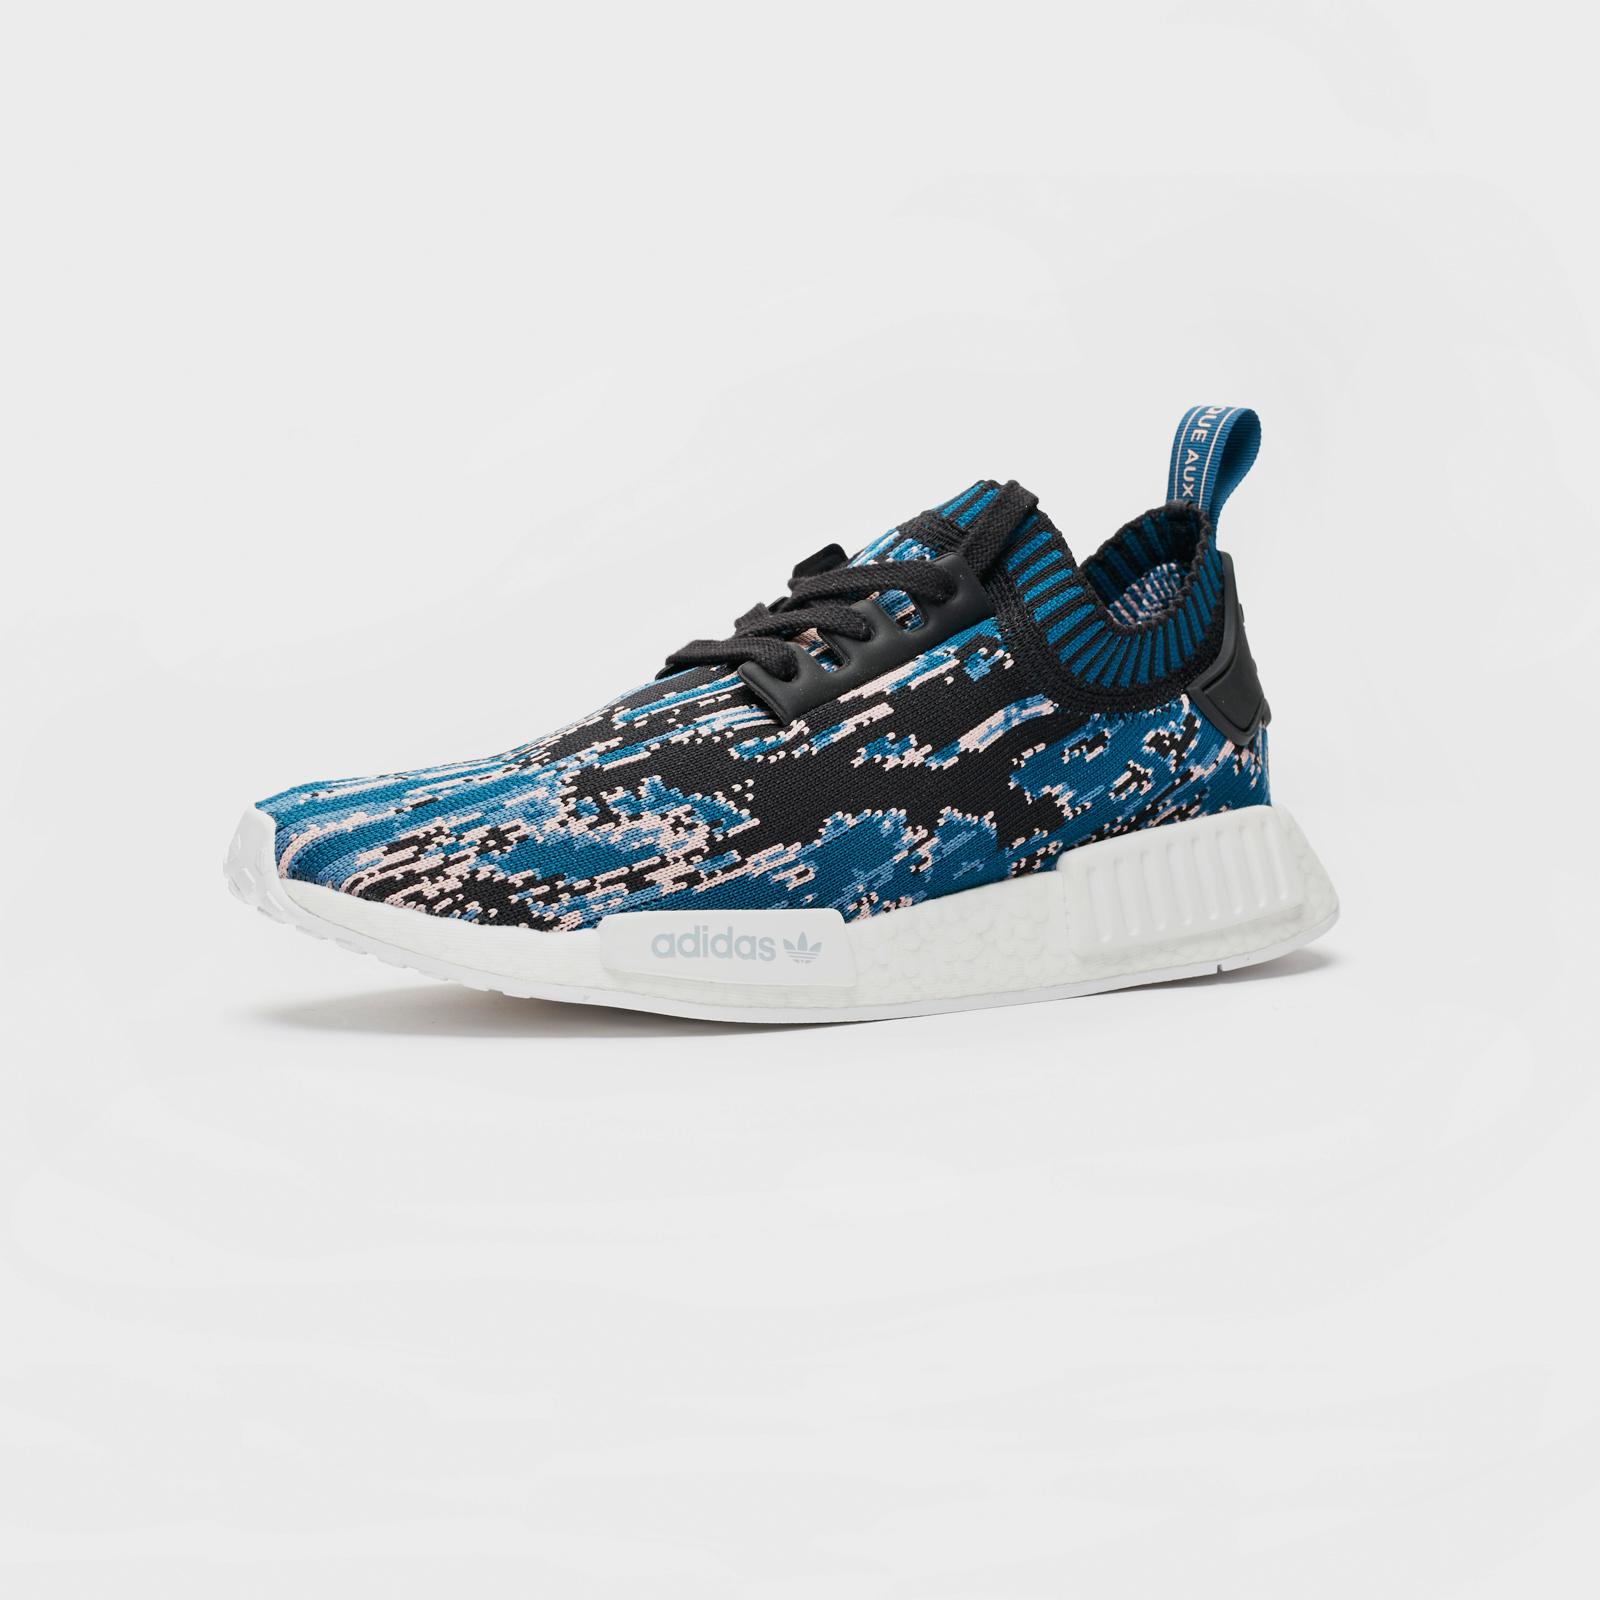 online retailer 32364 fd4fb Adidas Nmd R1 Pk Mosh Db2842 Sneakersnstuff Sneakers